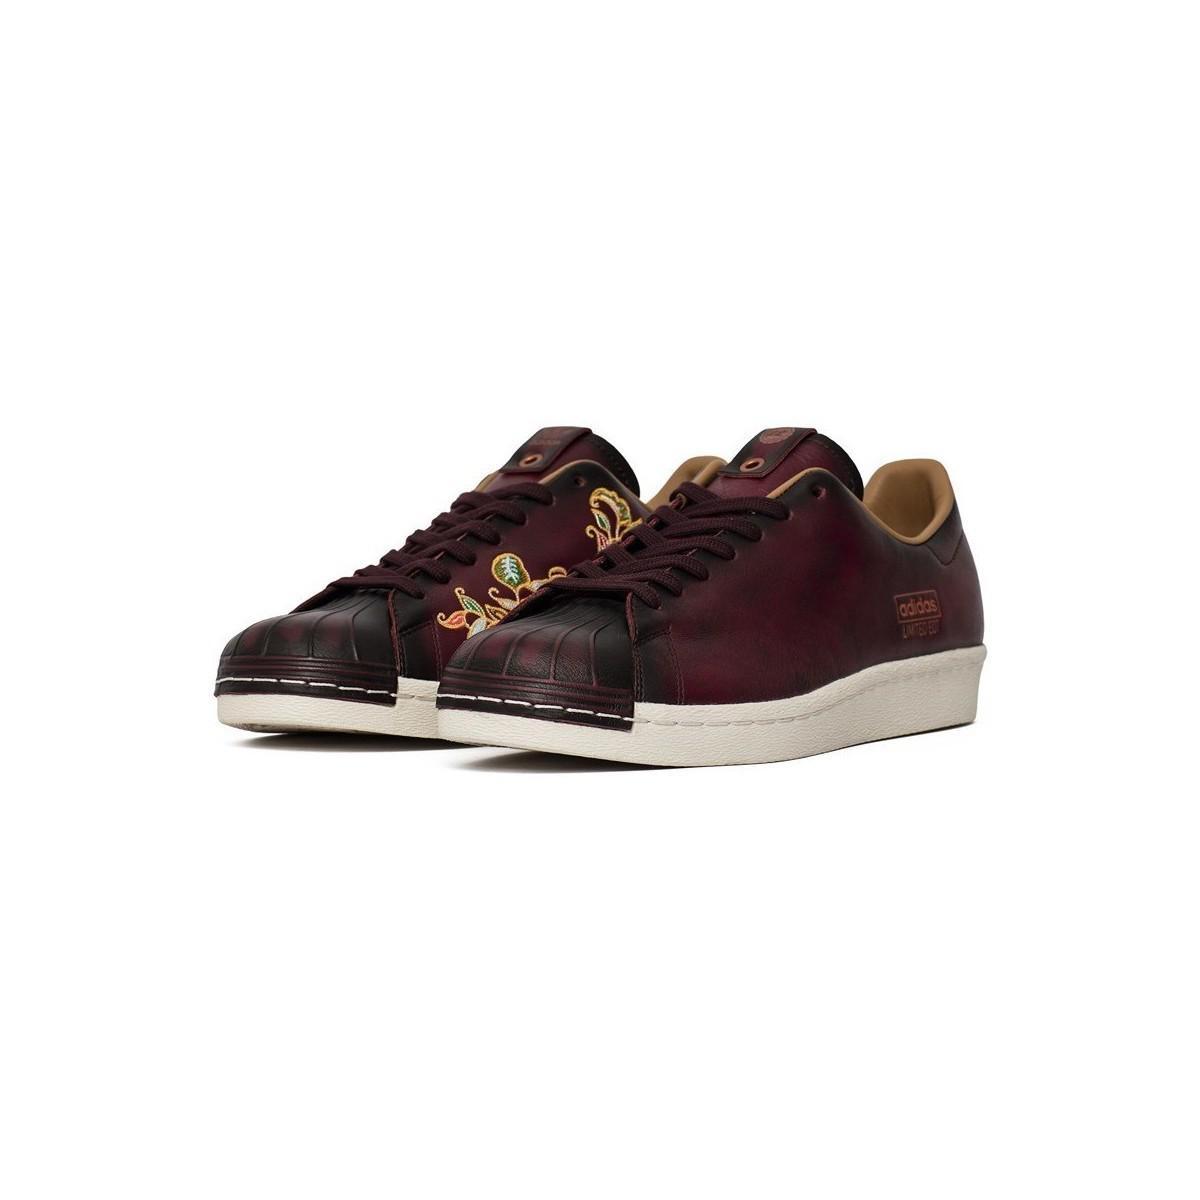 adidas Consortium X Limited Edt Superstar 80s Vault Men's Shoes (trainers) In Multicolour for Men